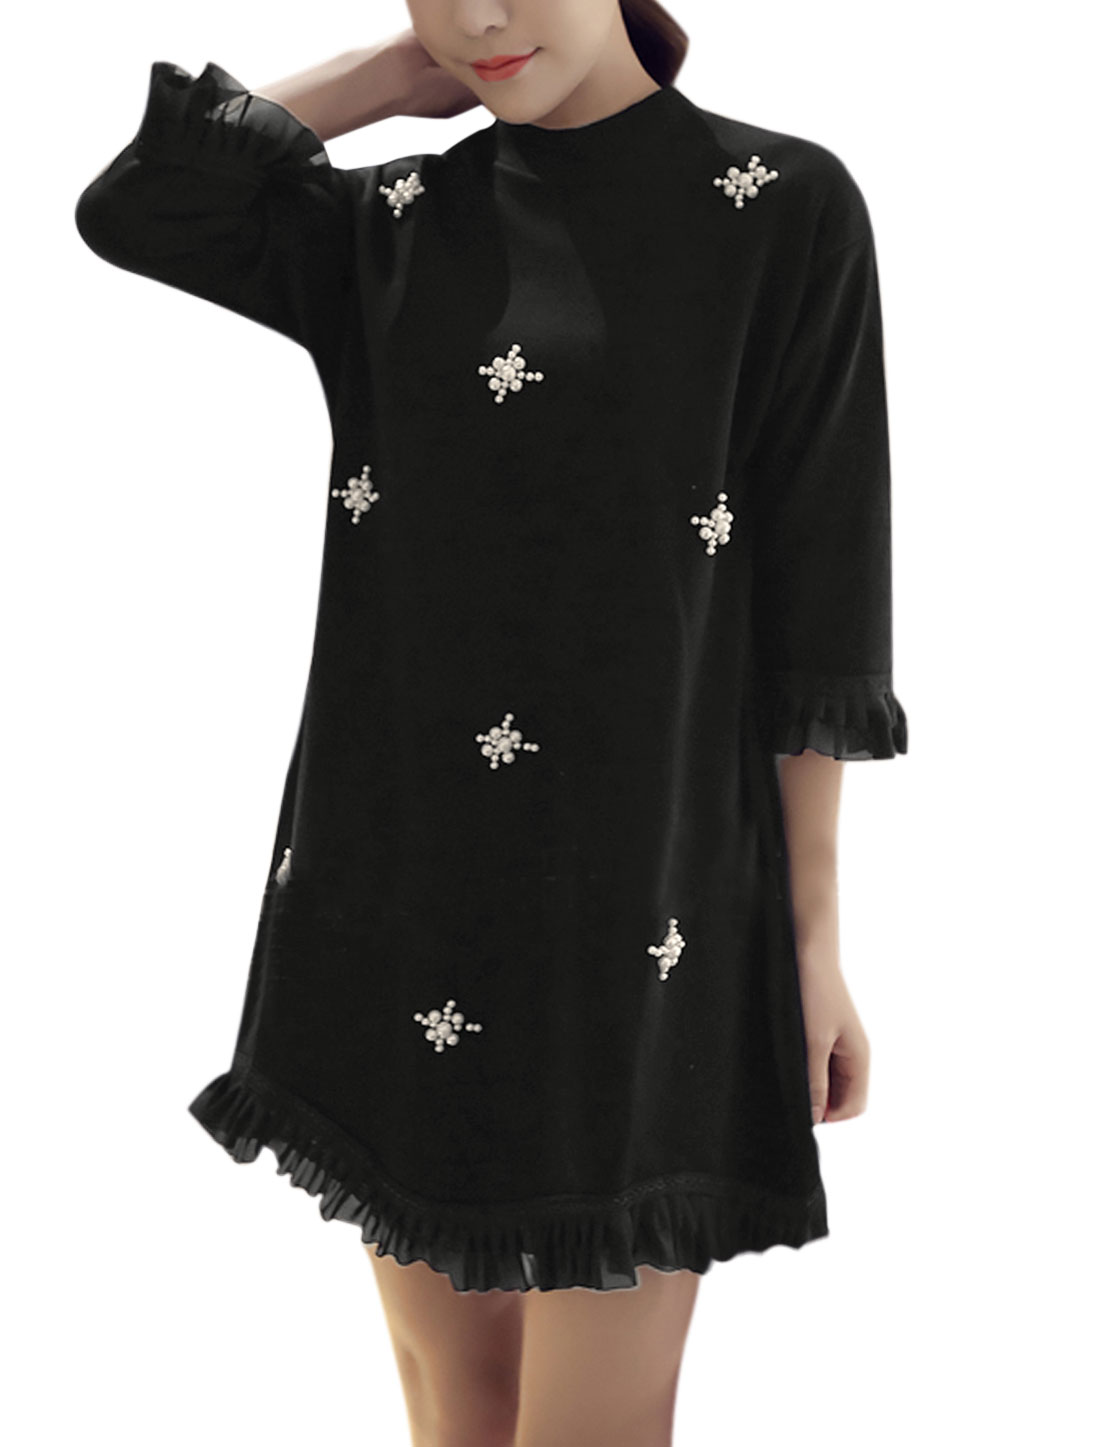 Women High Neck Ruffled Mesh Trim Beaded Tunic Dress Black XS